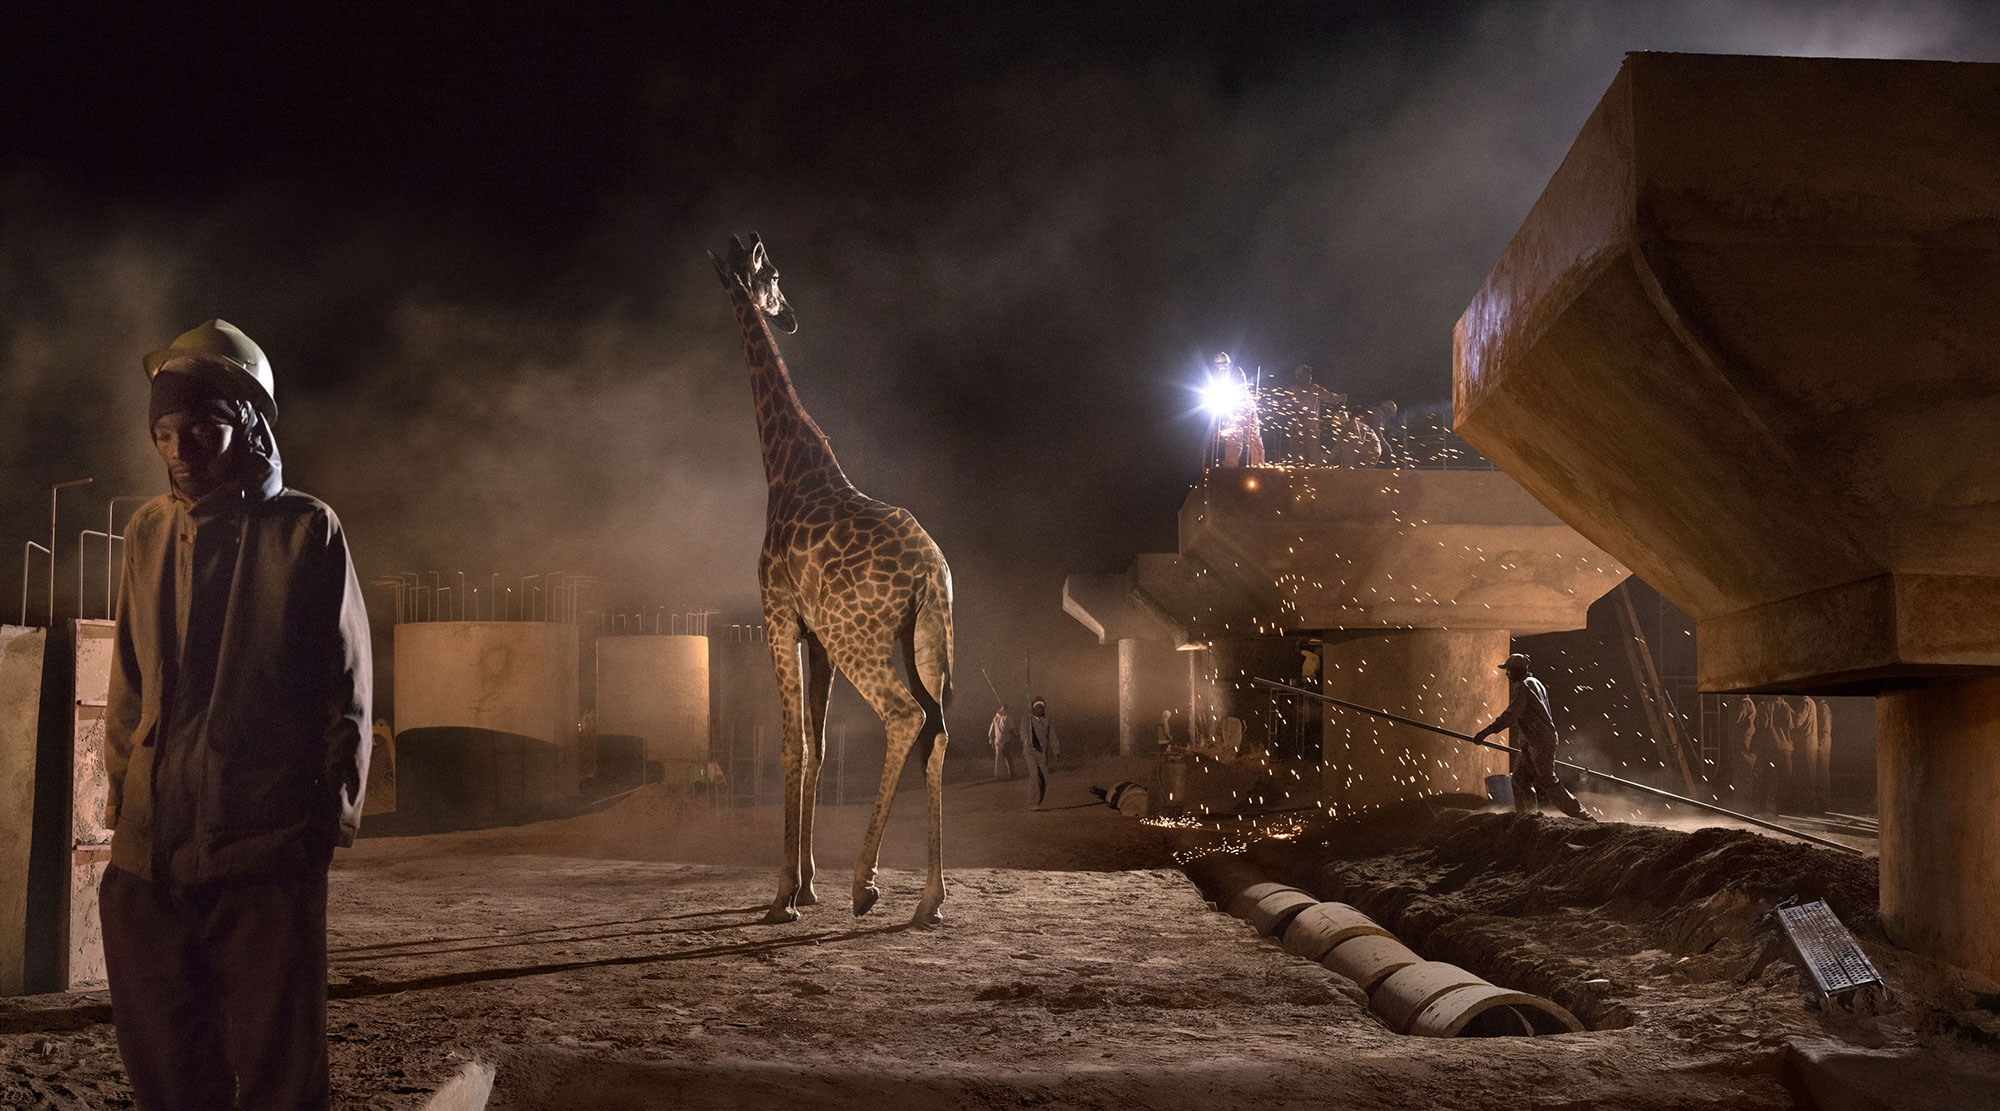 Bridge Construction With Giraffe & Worker. Copyright Nick Brandt.